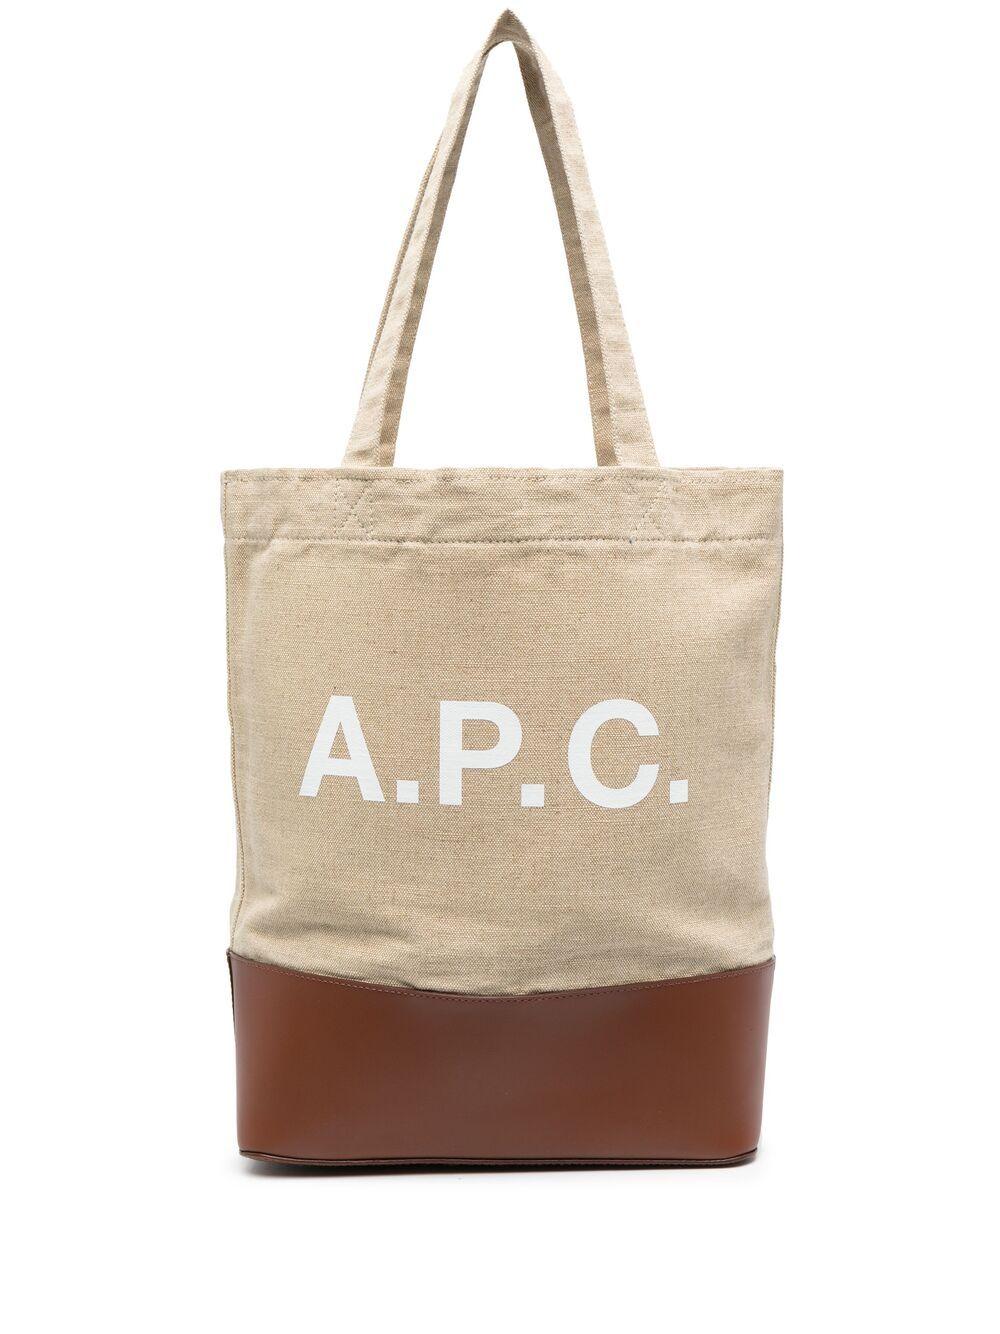 <p class='small-title'>A.P.C.</p>A.P.C. Tote Bag